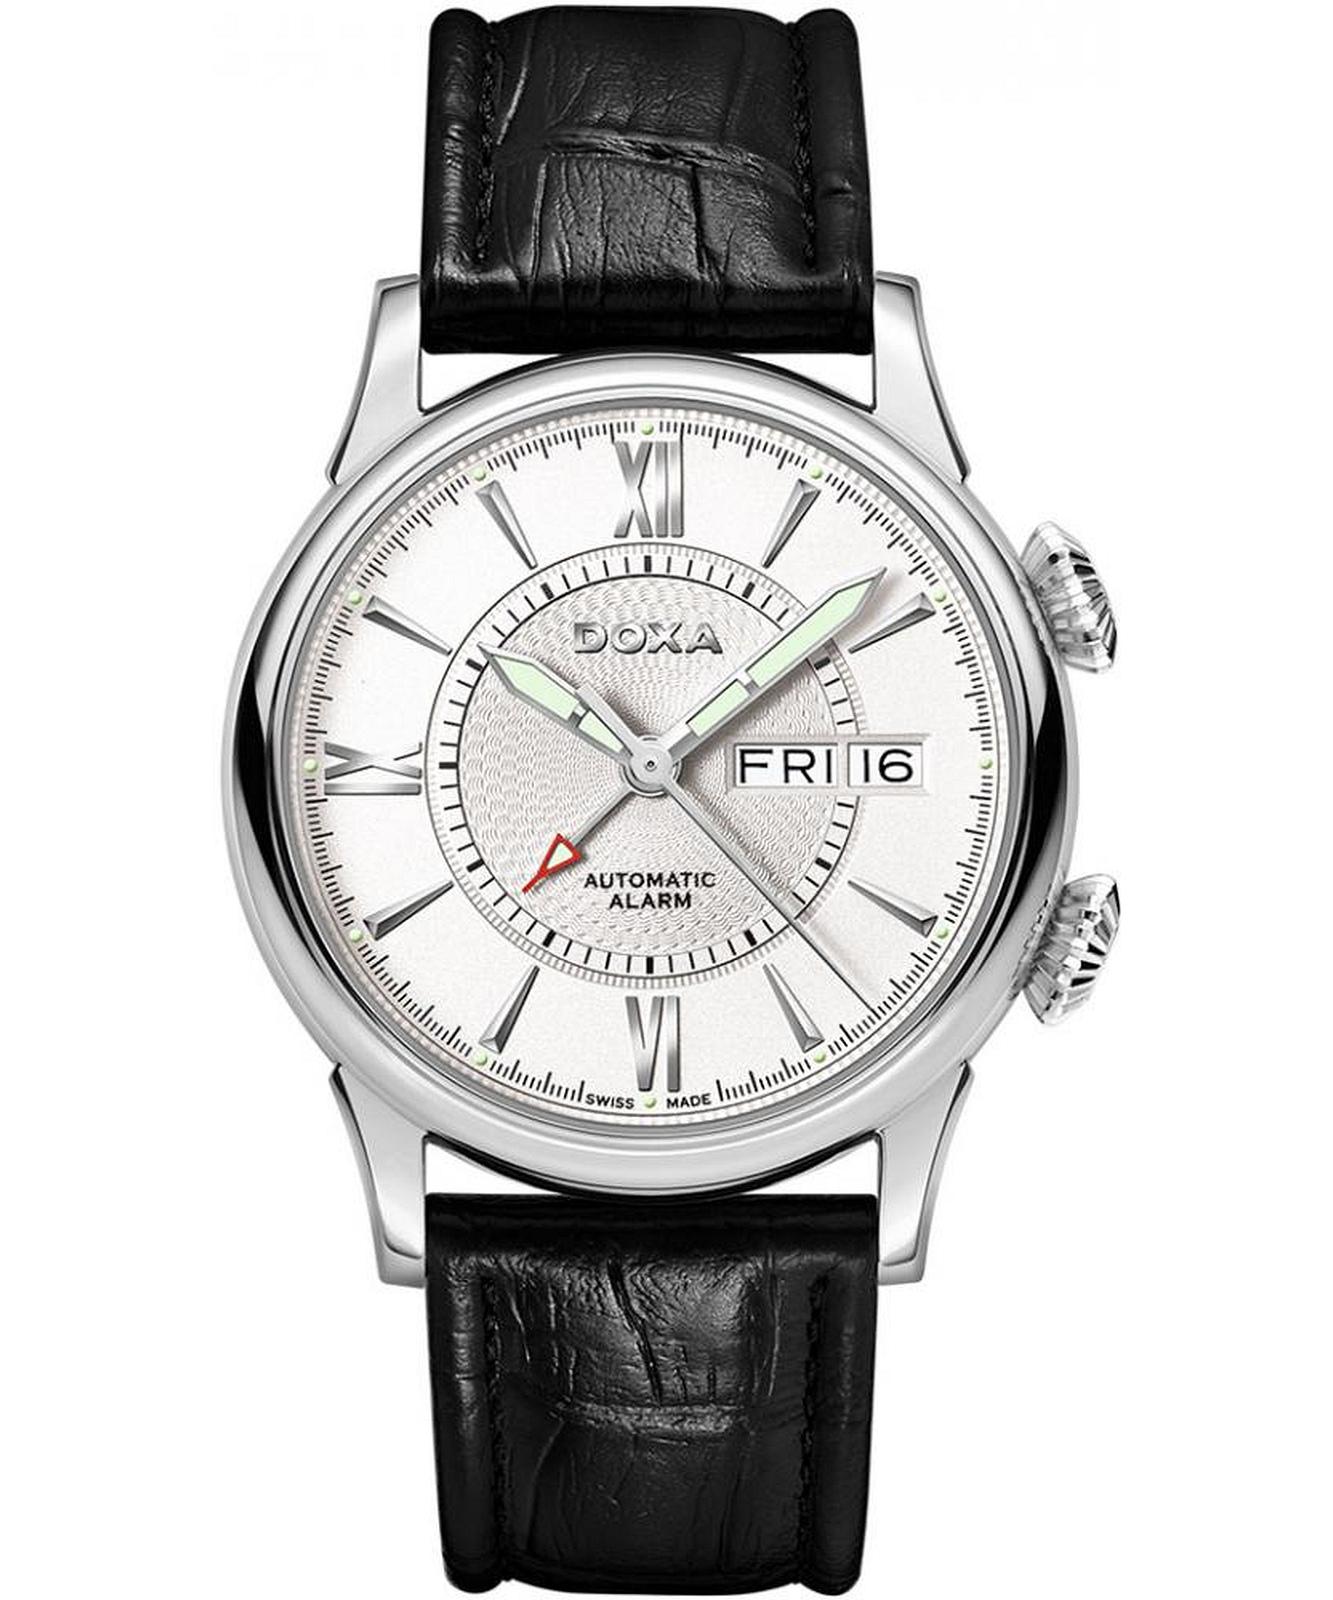 zegarek-meski-doxa-vintage-fusion-alarm-automatic-limited-edition-625-10-022-01